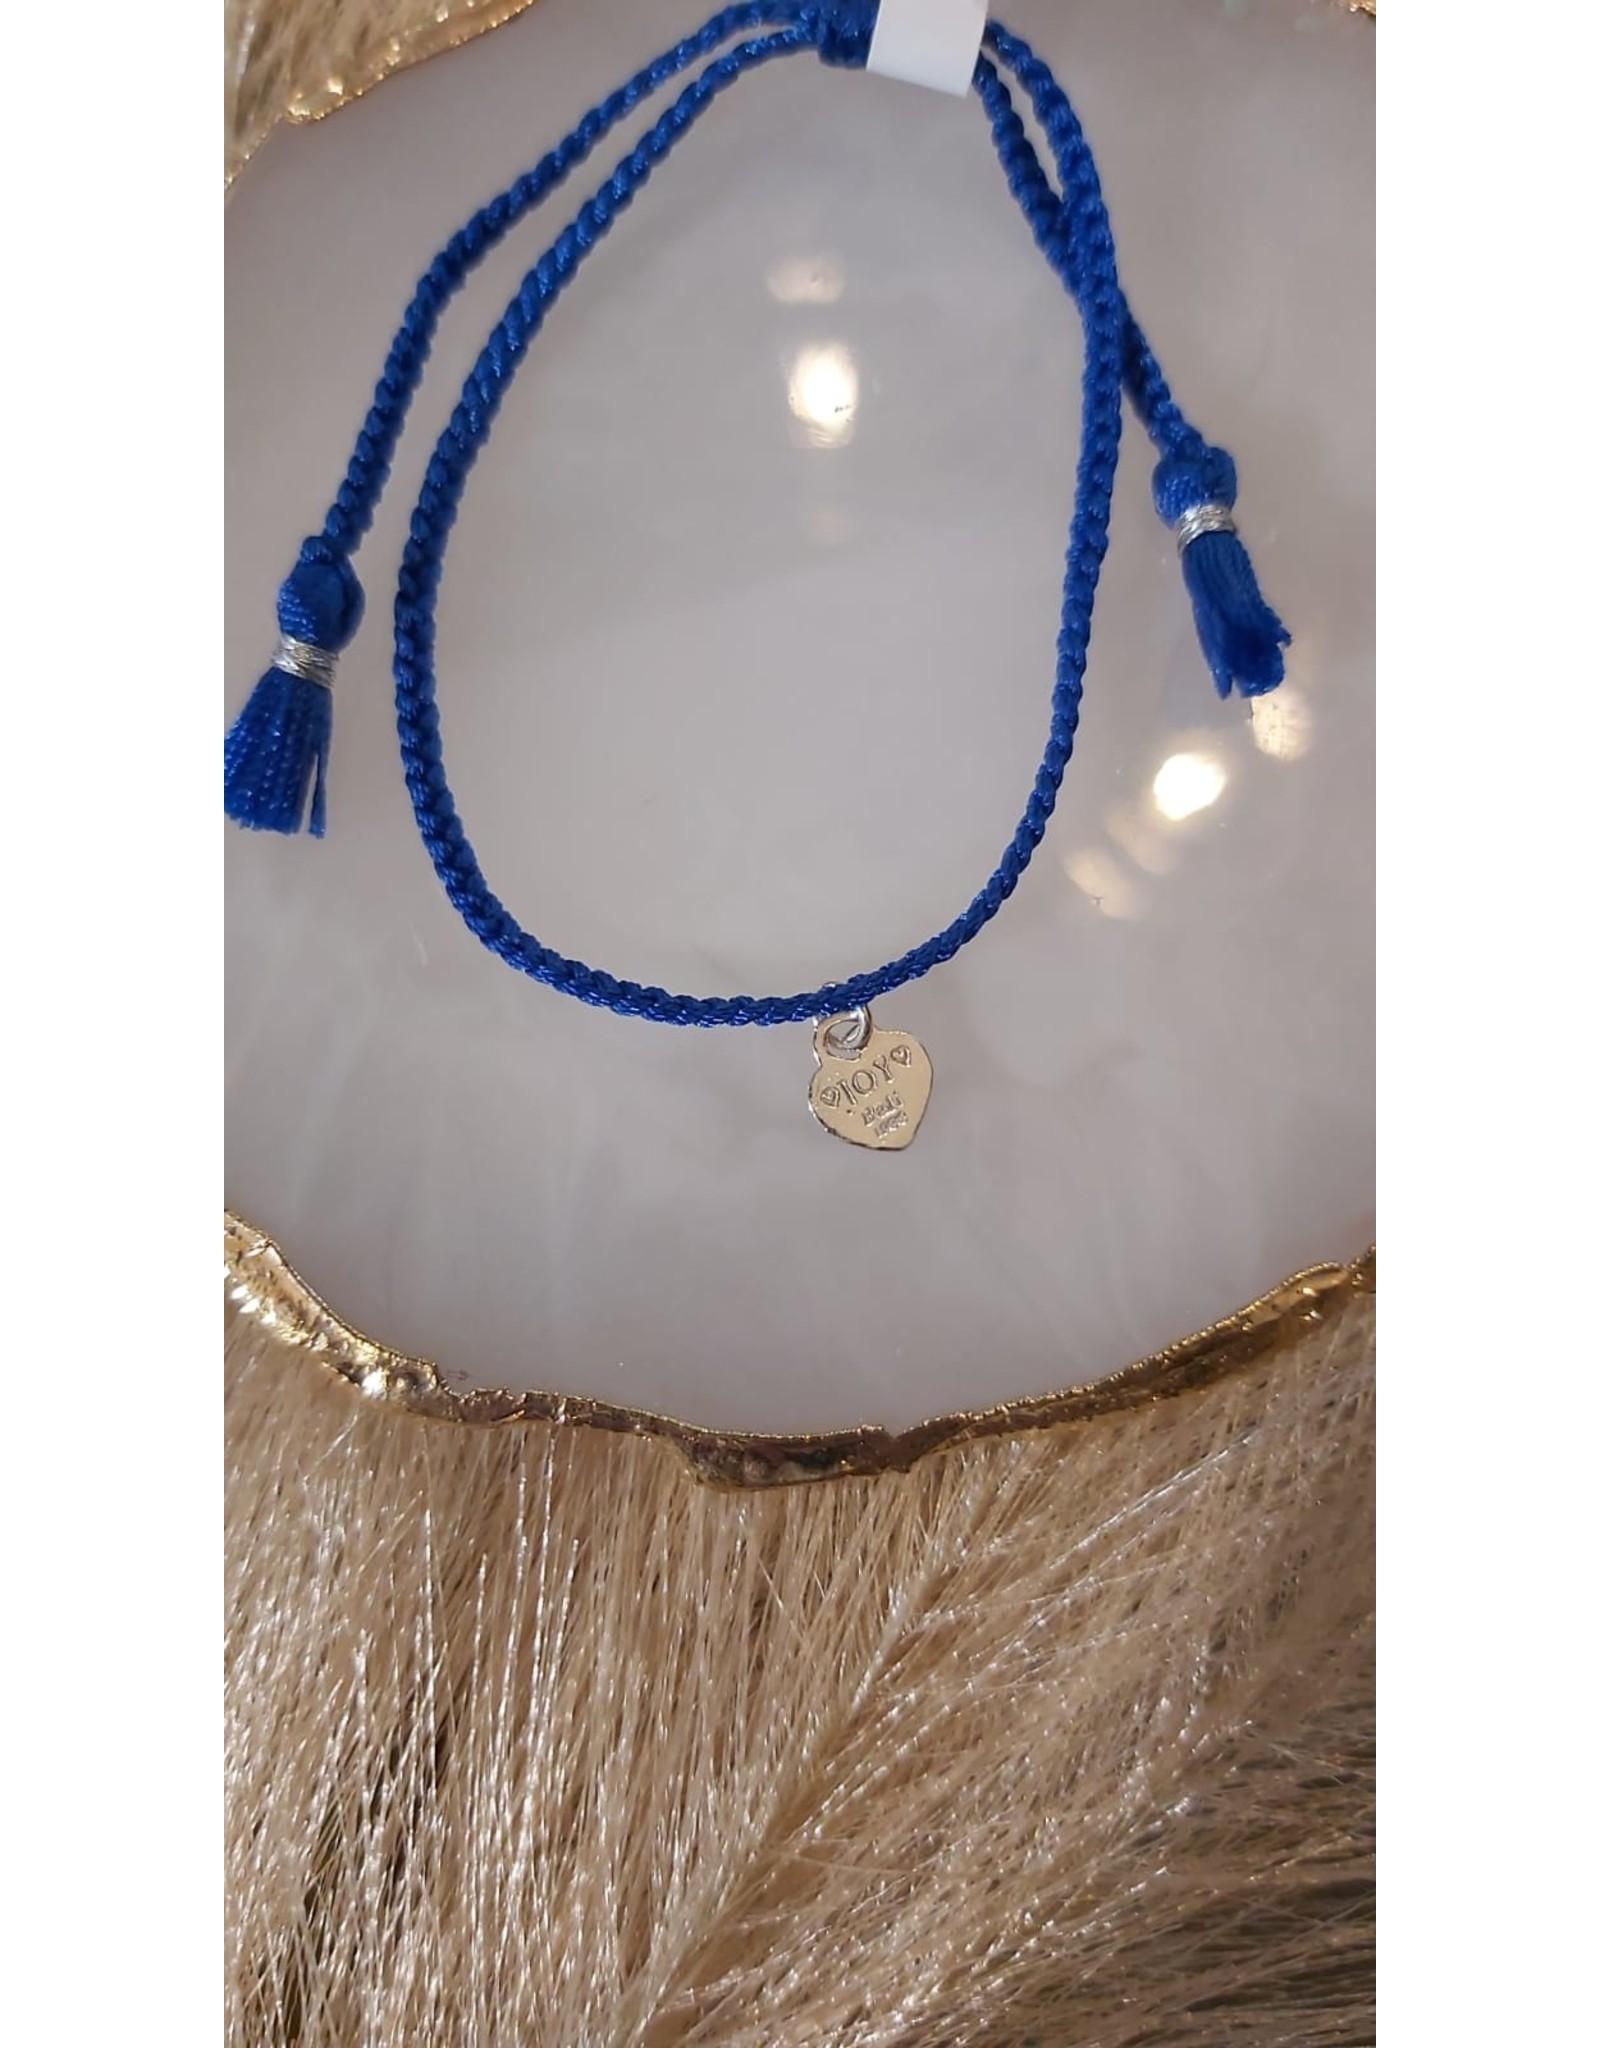 Joy Bali JOY Bali Iluh armband - Kobalt blauw